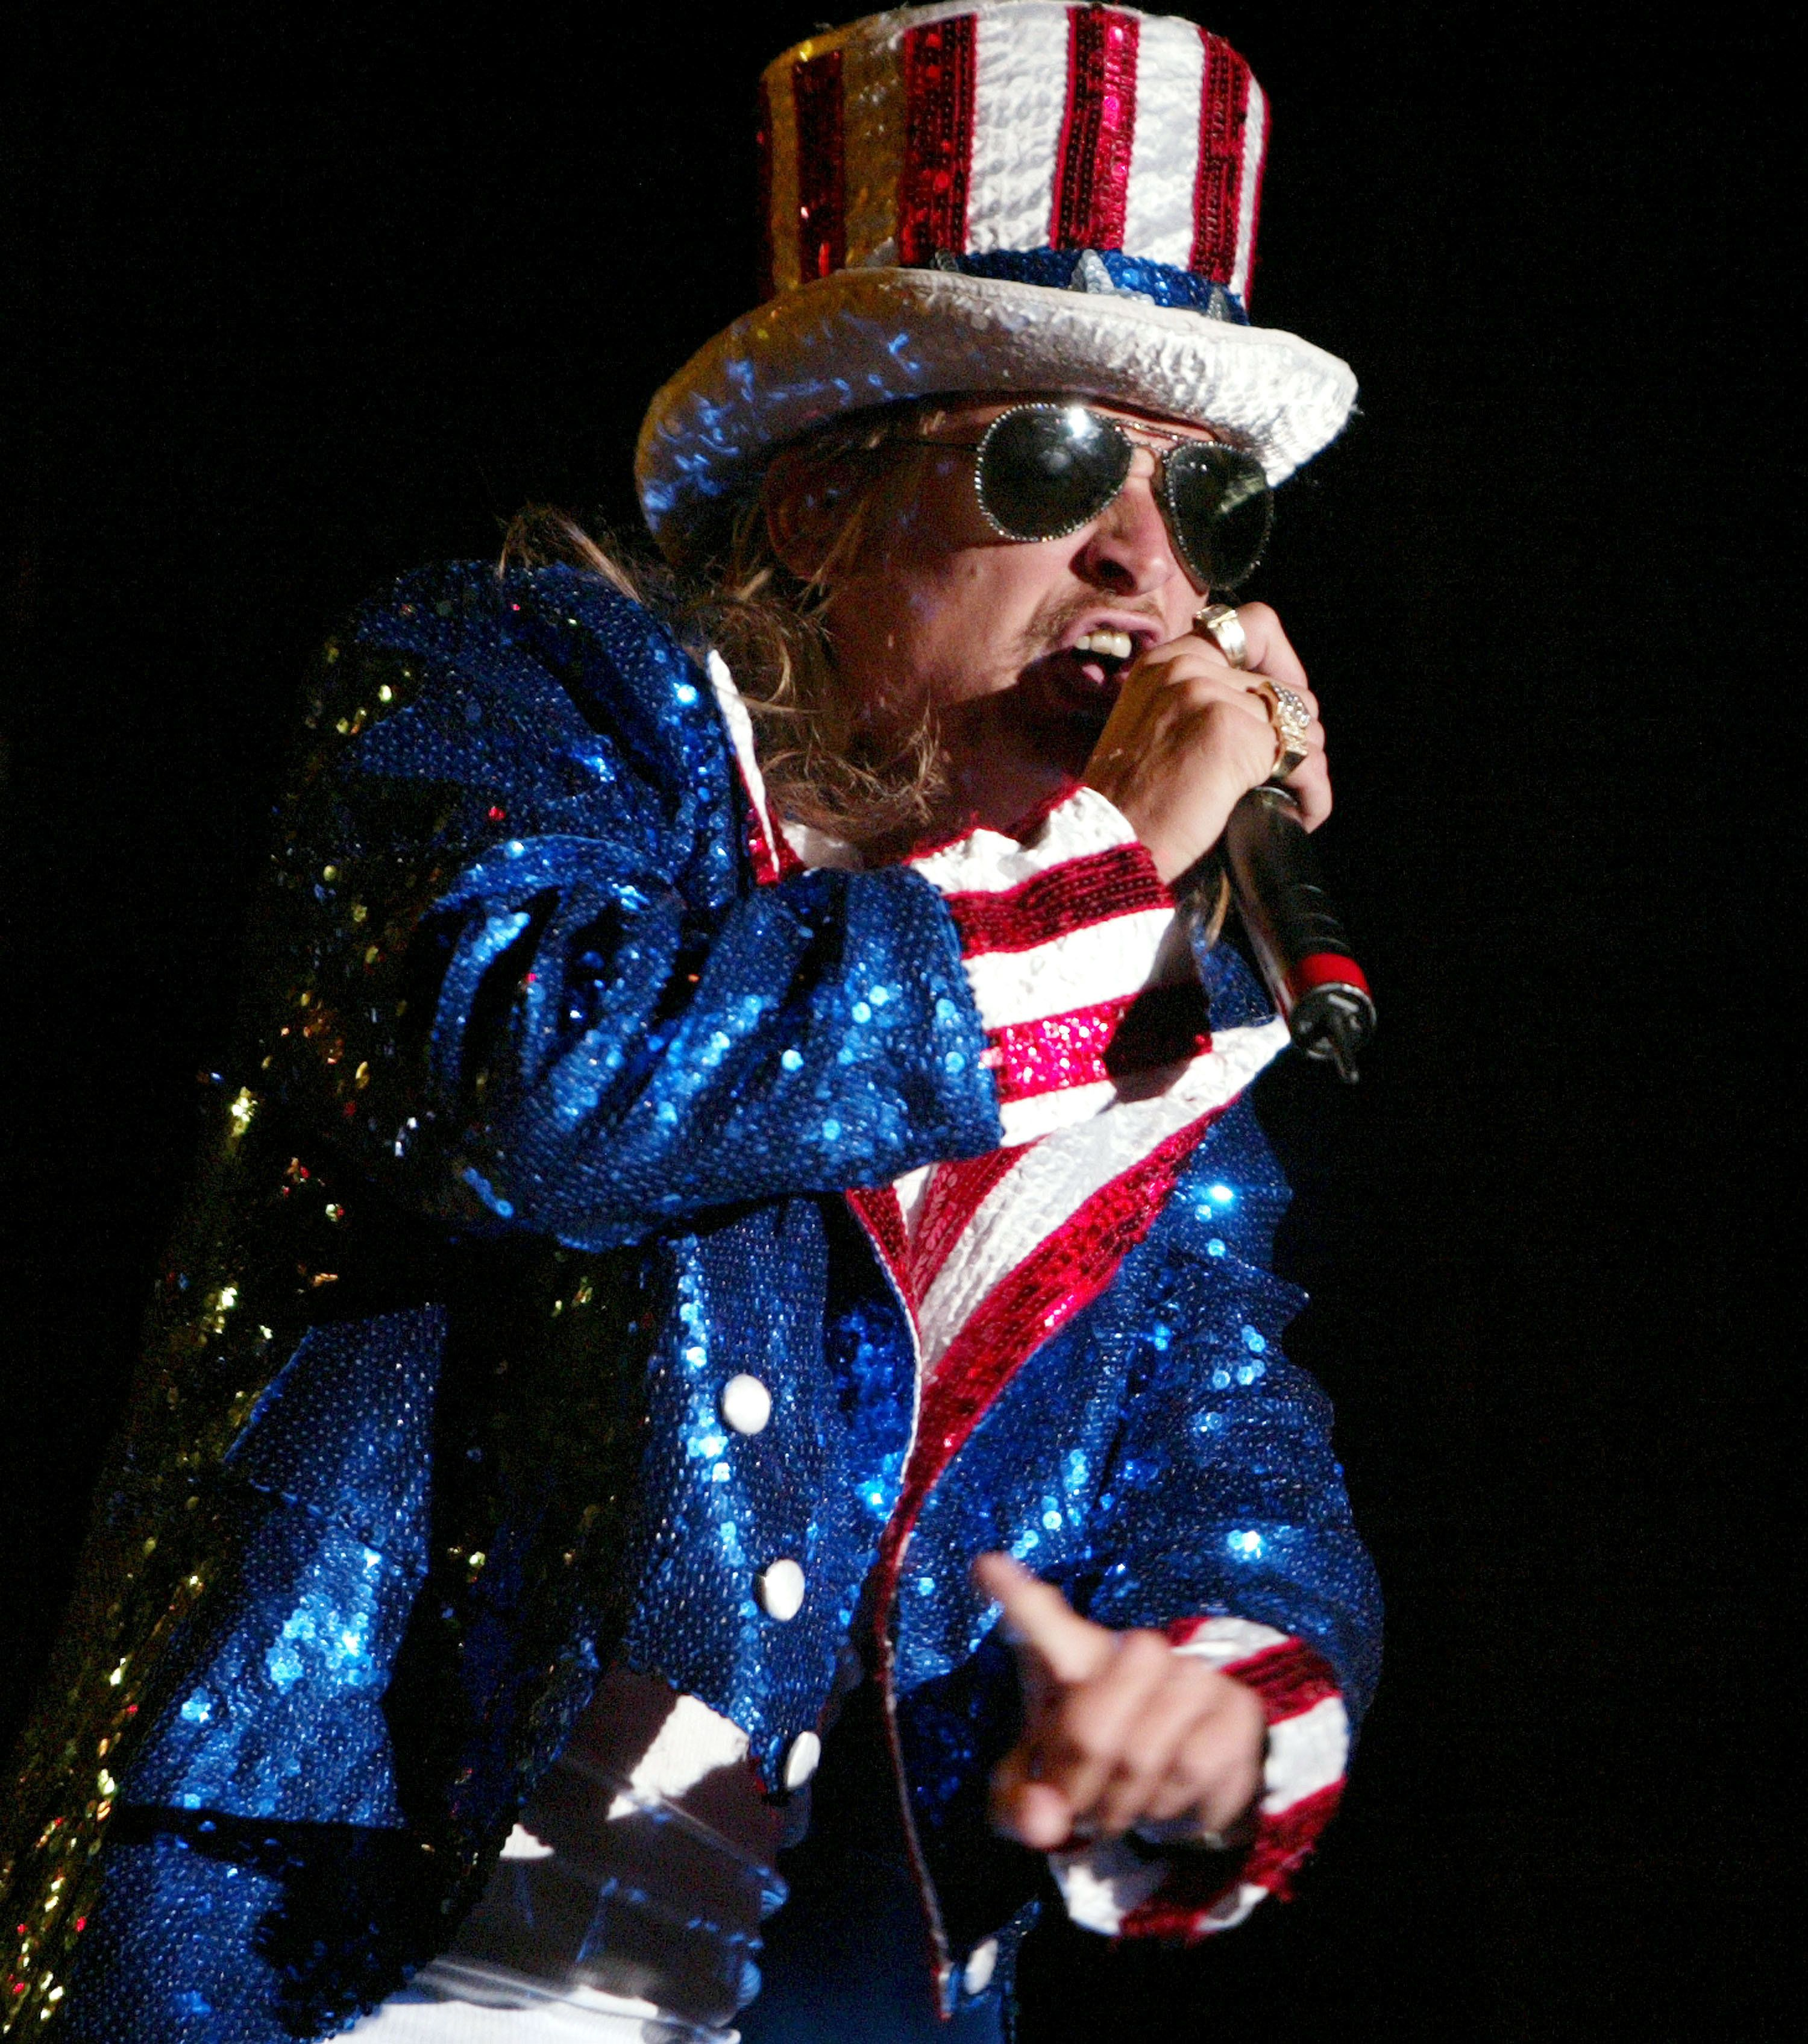 Kid Rock during Kid Rock's 4th of July Performance at Trump Taj Mahal Casino at Trump Taj Mahal Casino in Atlantic City, New Jersey, United States. (Photo by Chris Polk/FilmMagic)